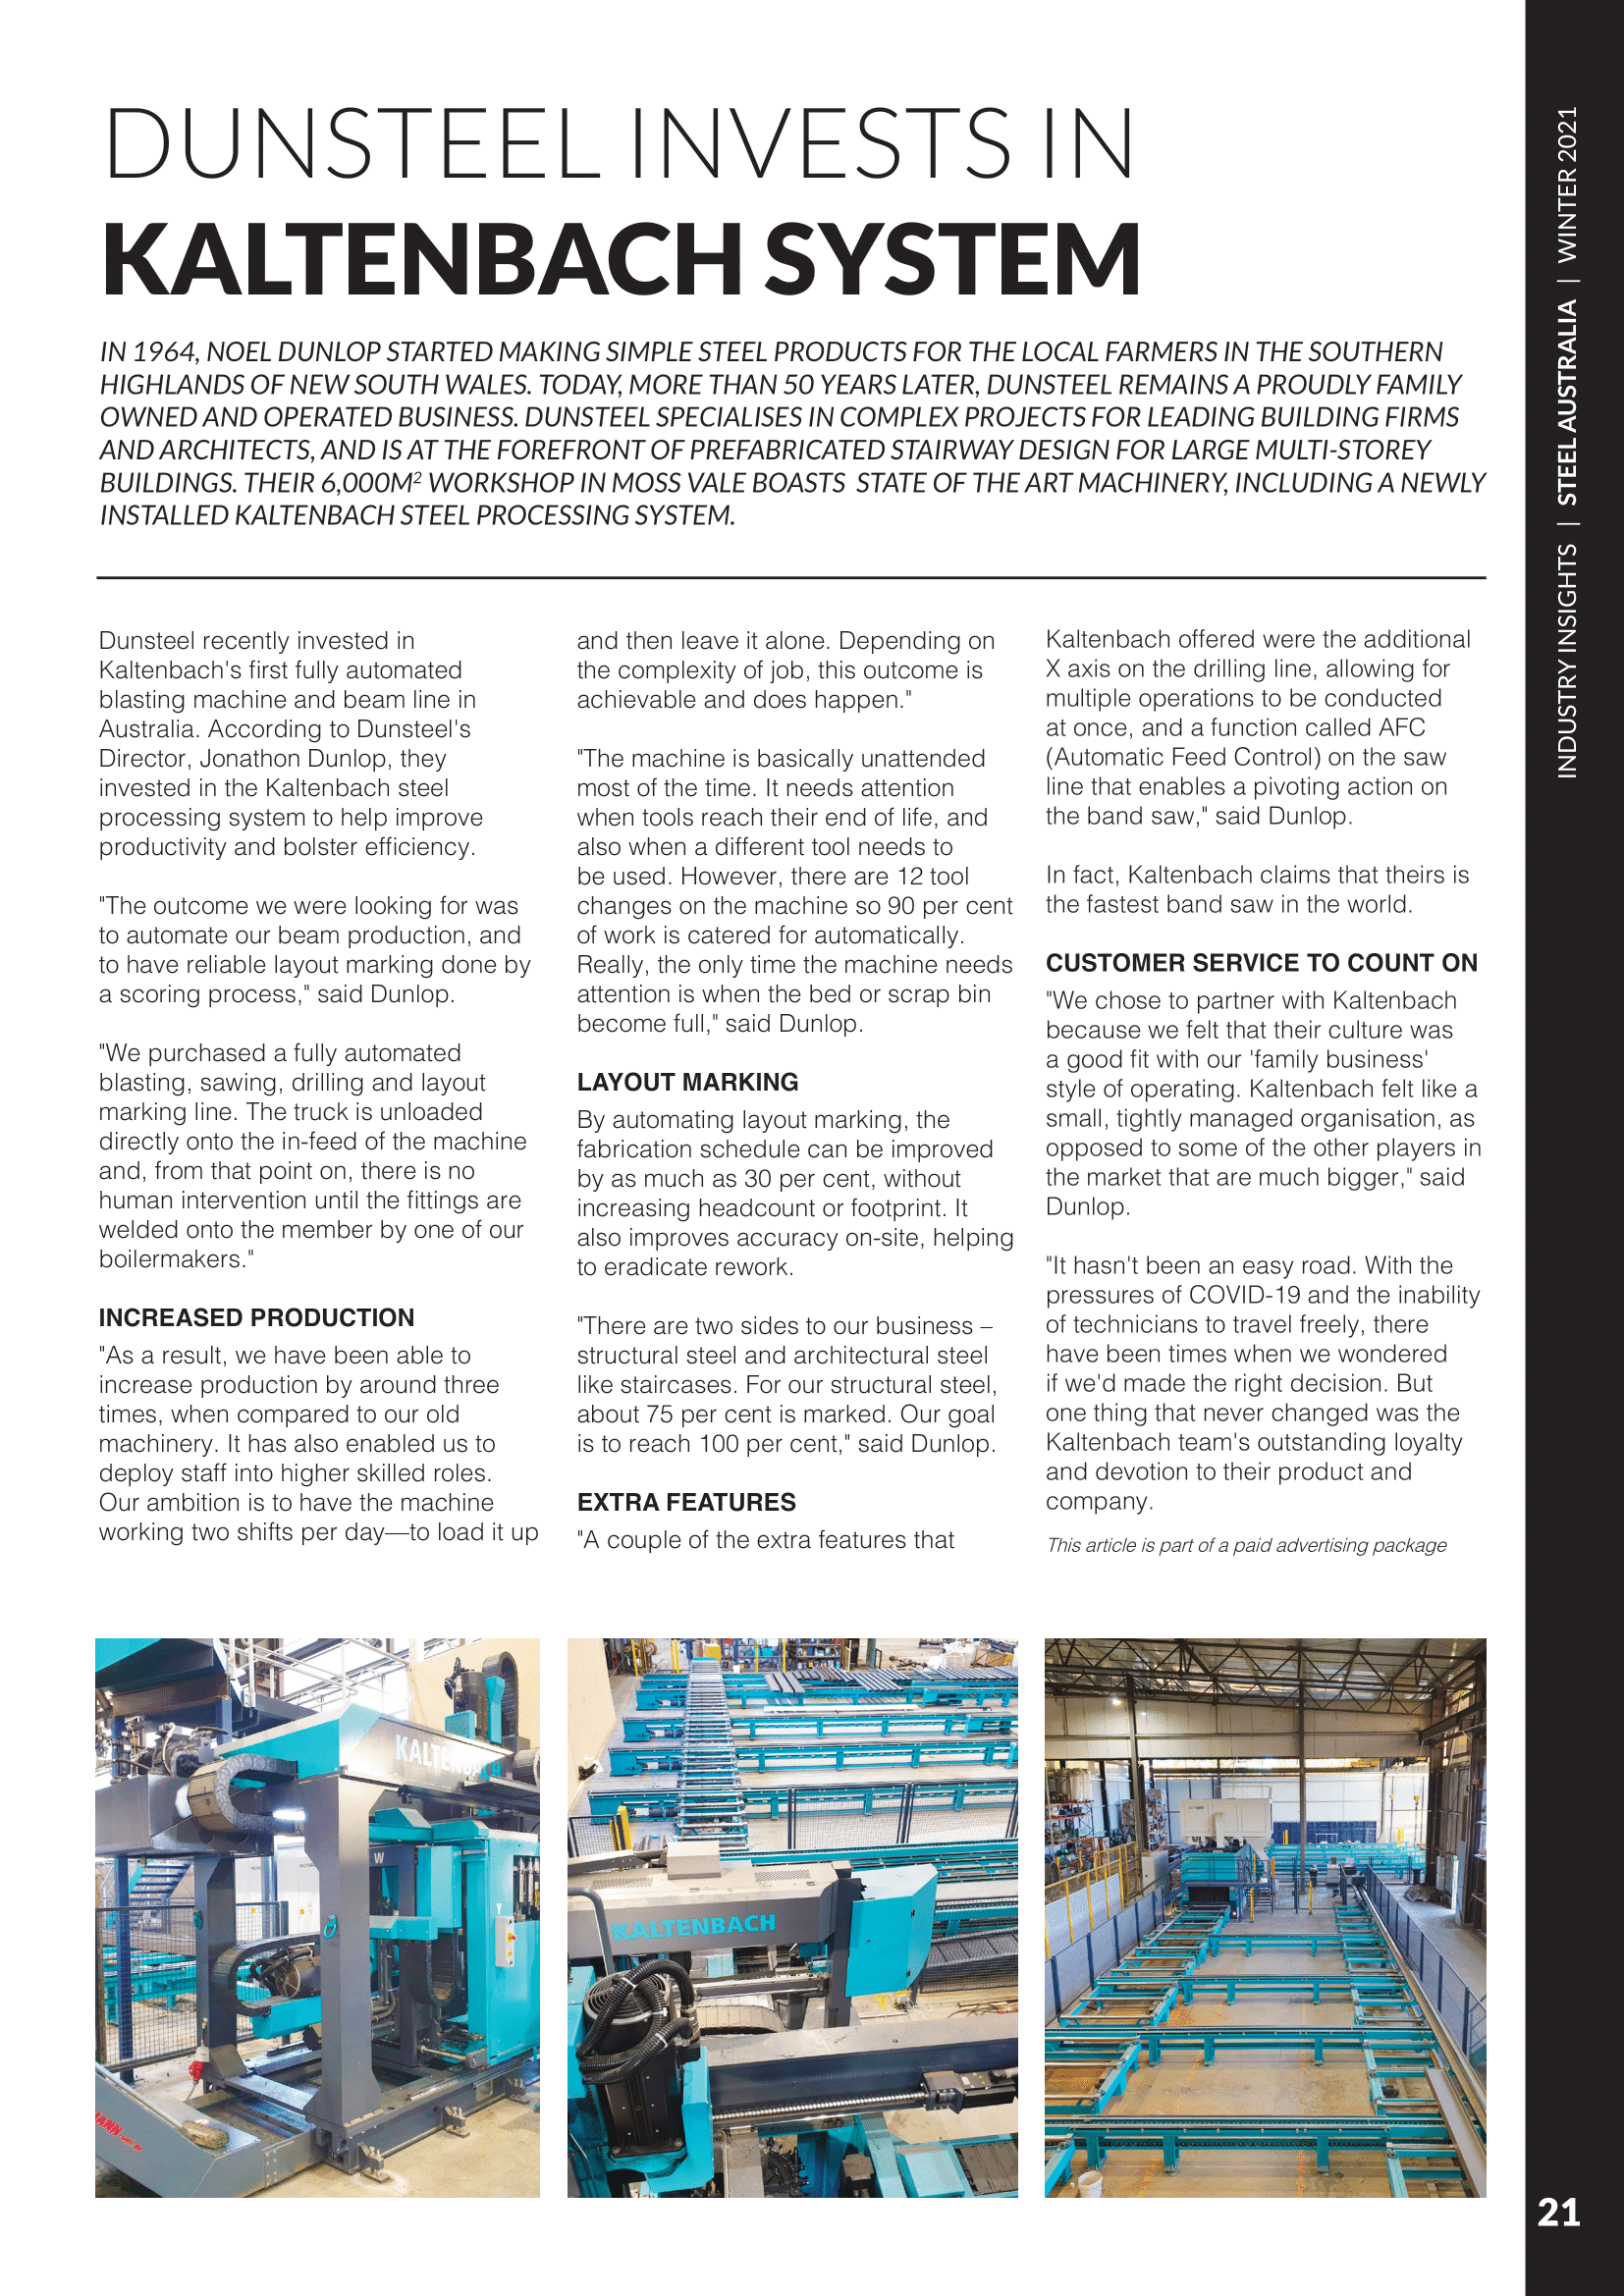 steel Australia - Winter 2021 - Dunsteel V2-1